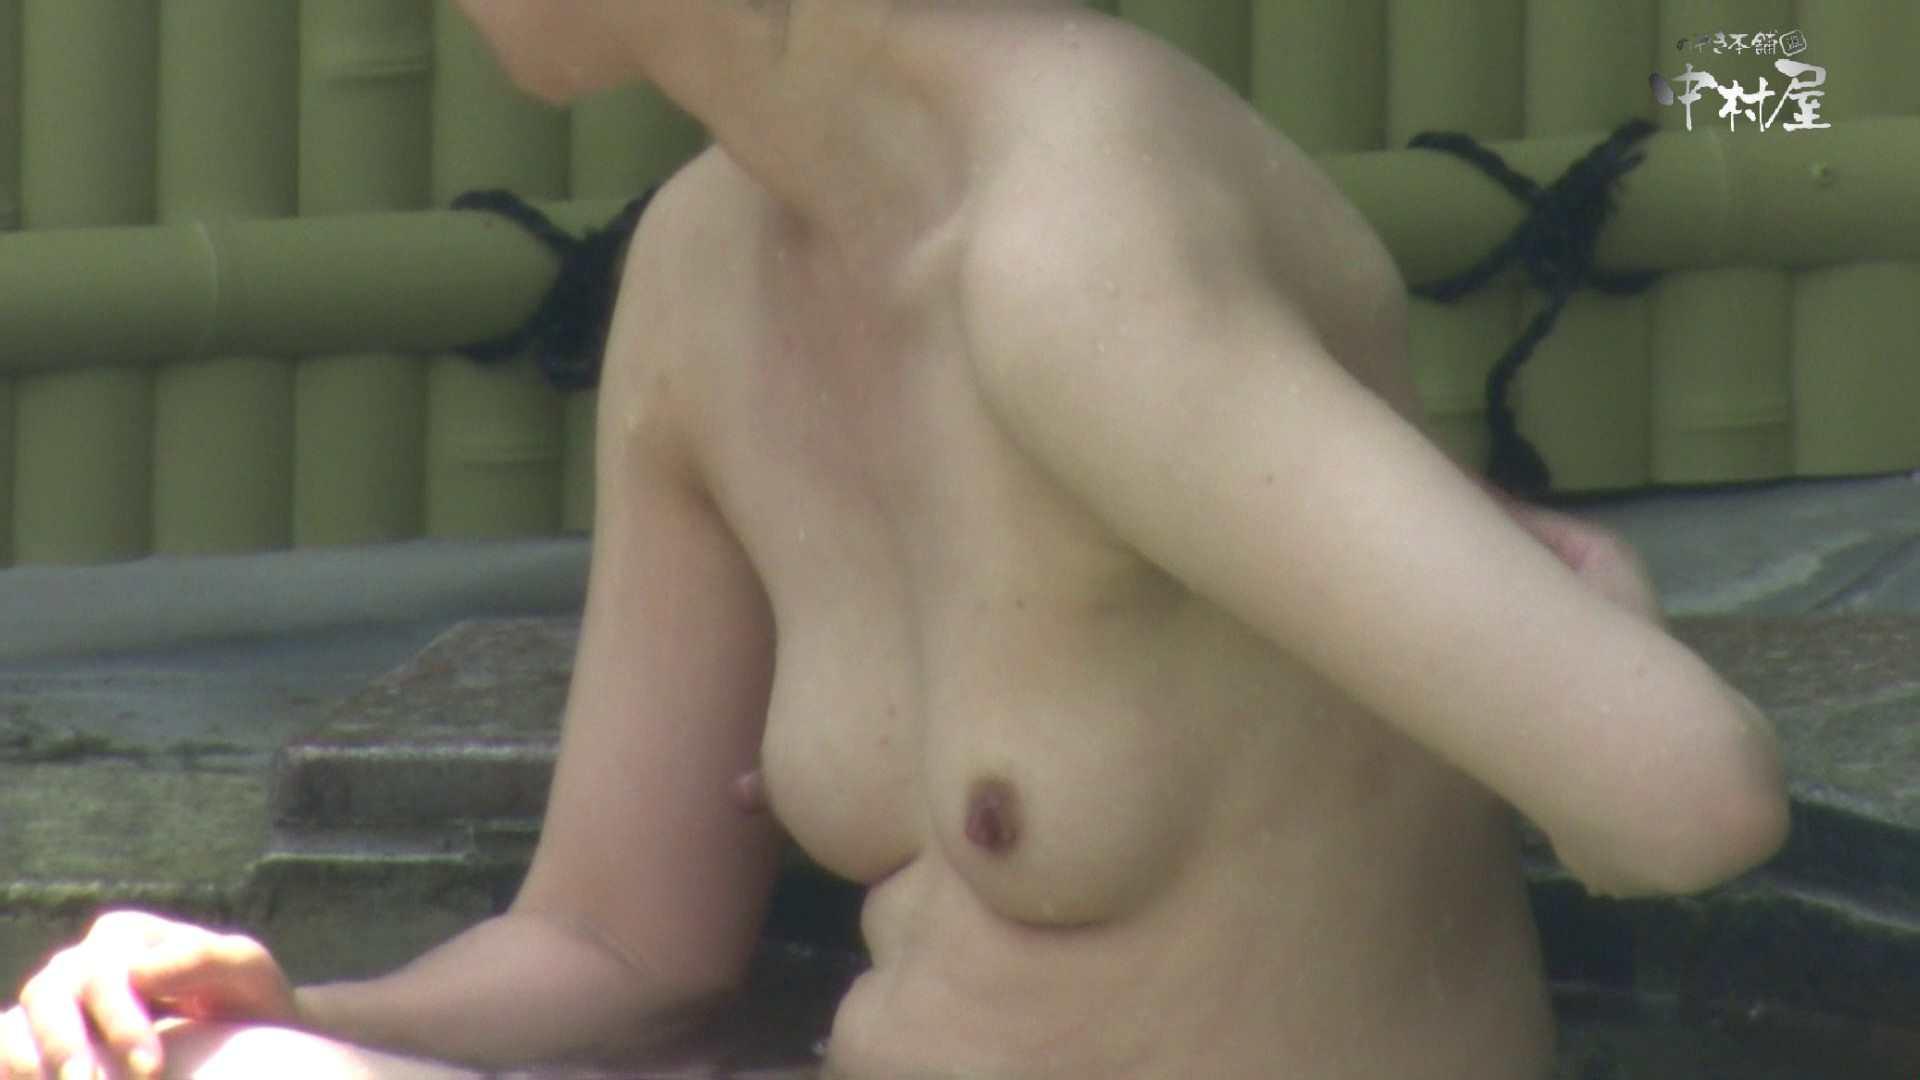 Aquaな露天風呂Vol.888 OLセックス  77画像 15